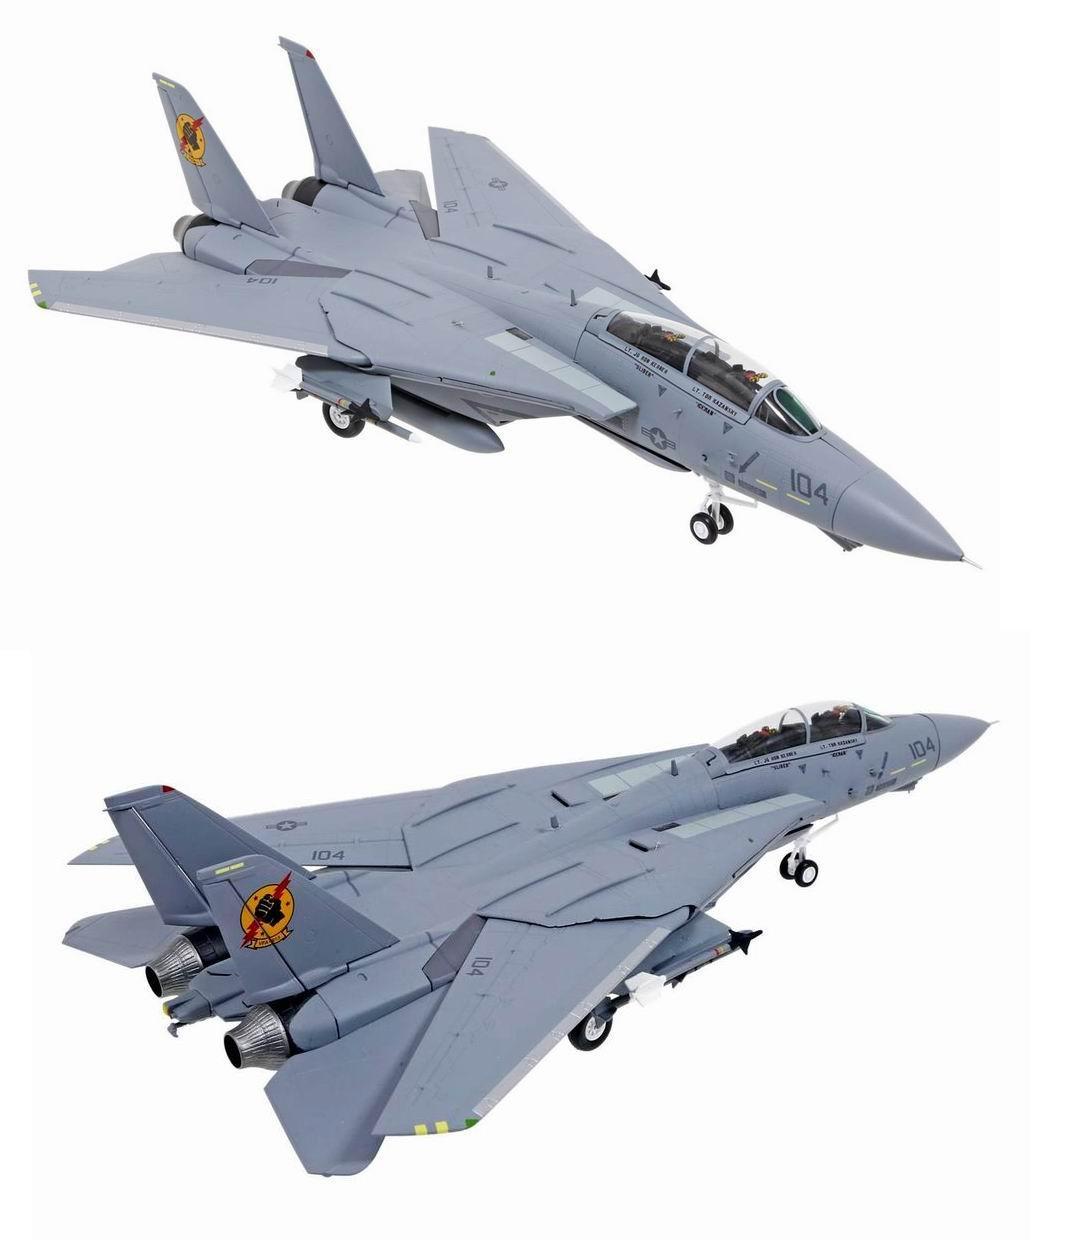 Maquette Avion de combat Grumman F-14A TOMCAT Film TOP GUN Iceman et Slider 1/72